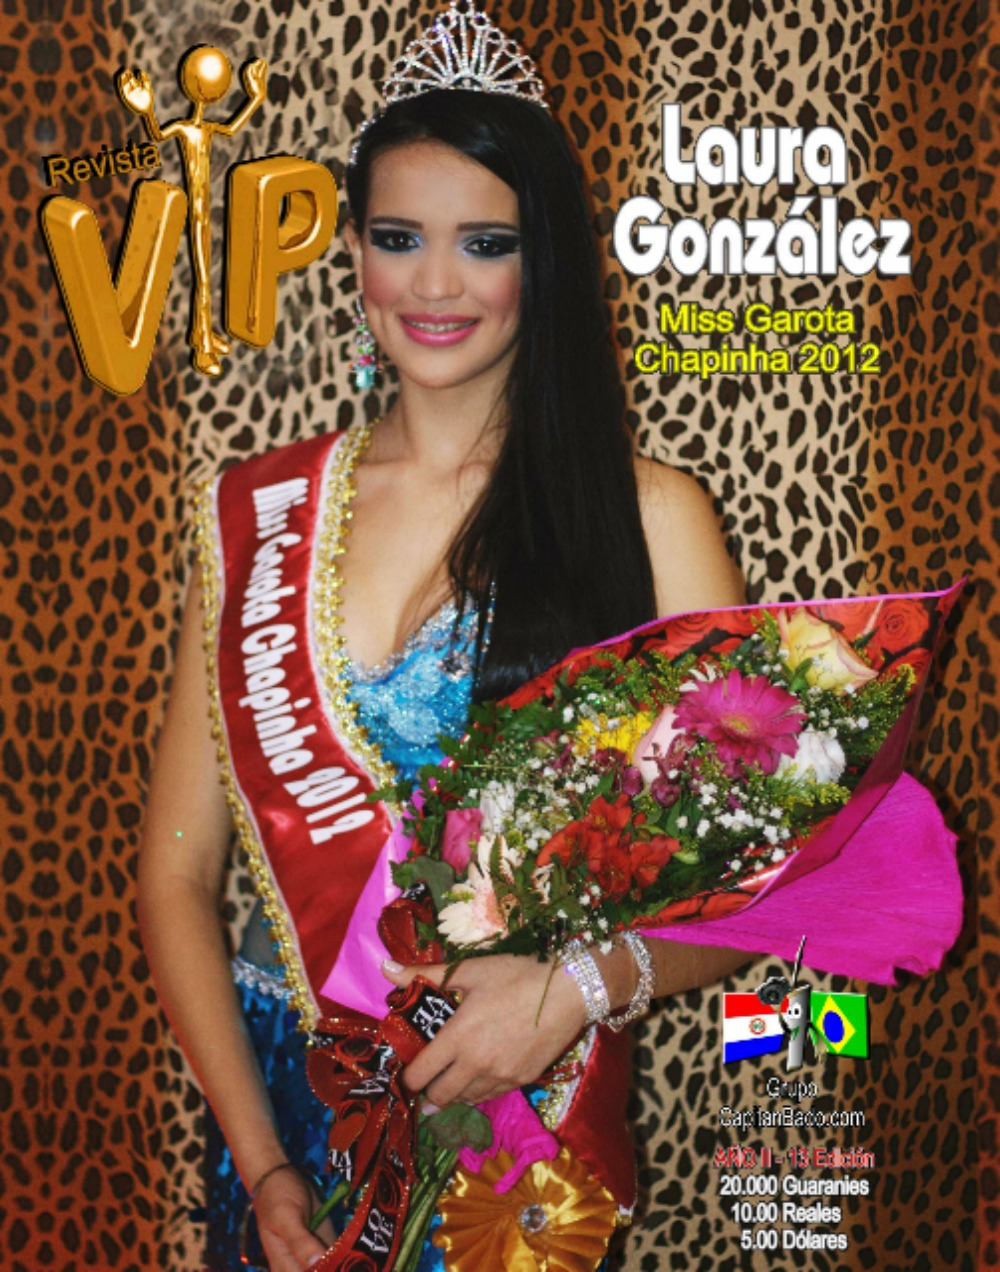 Vip 13 Paraguay